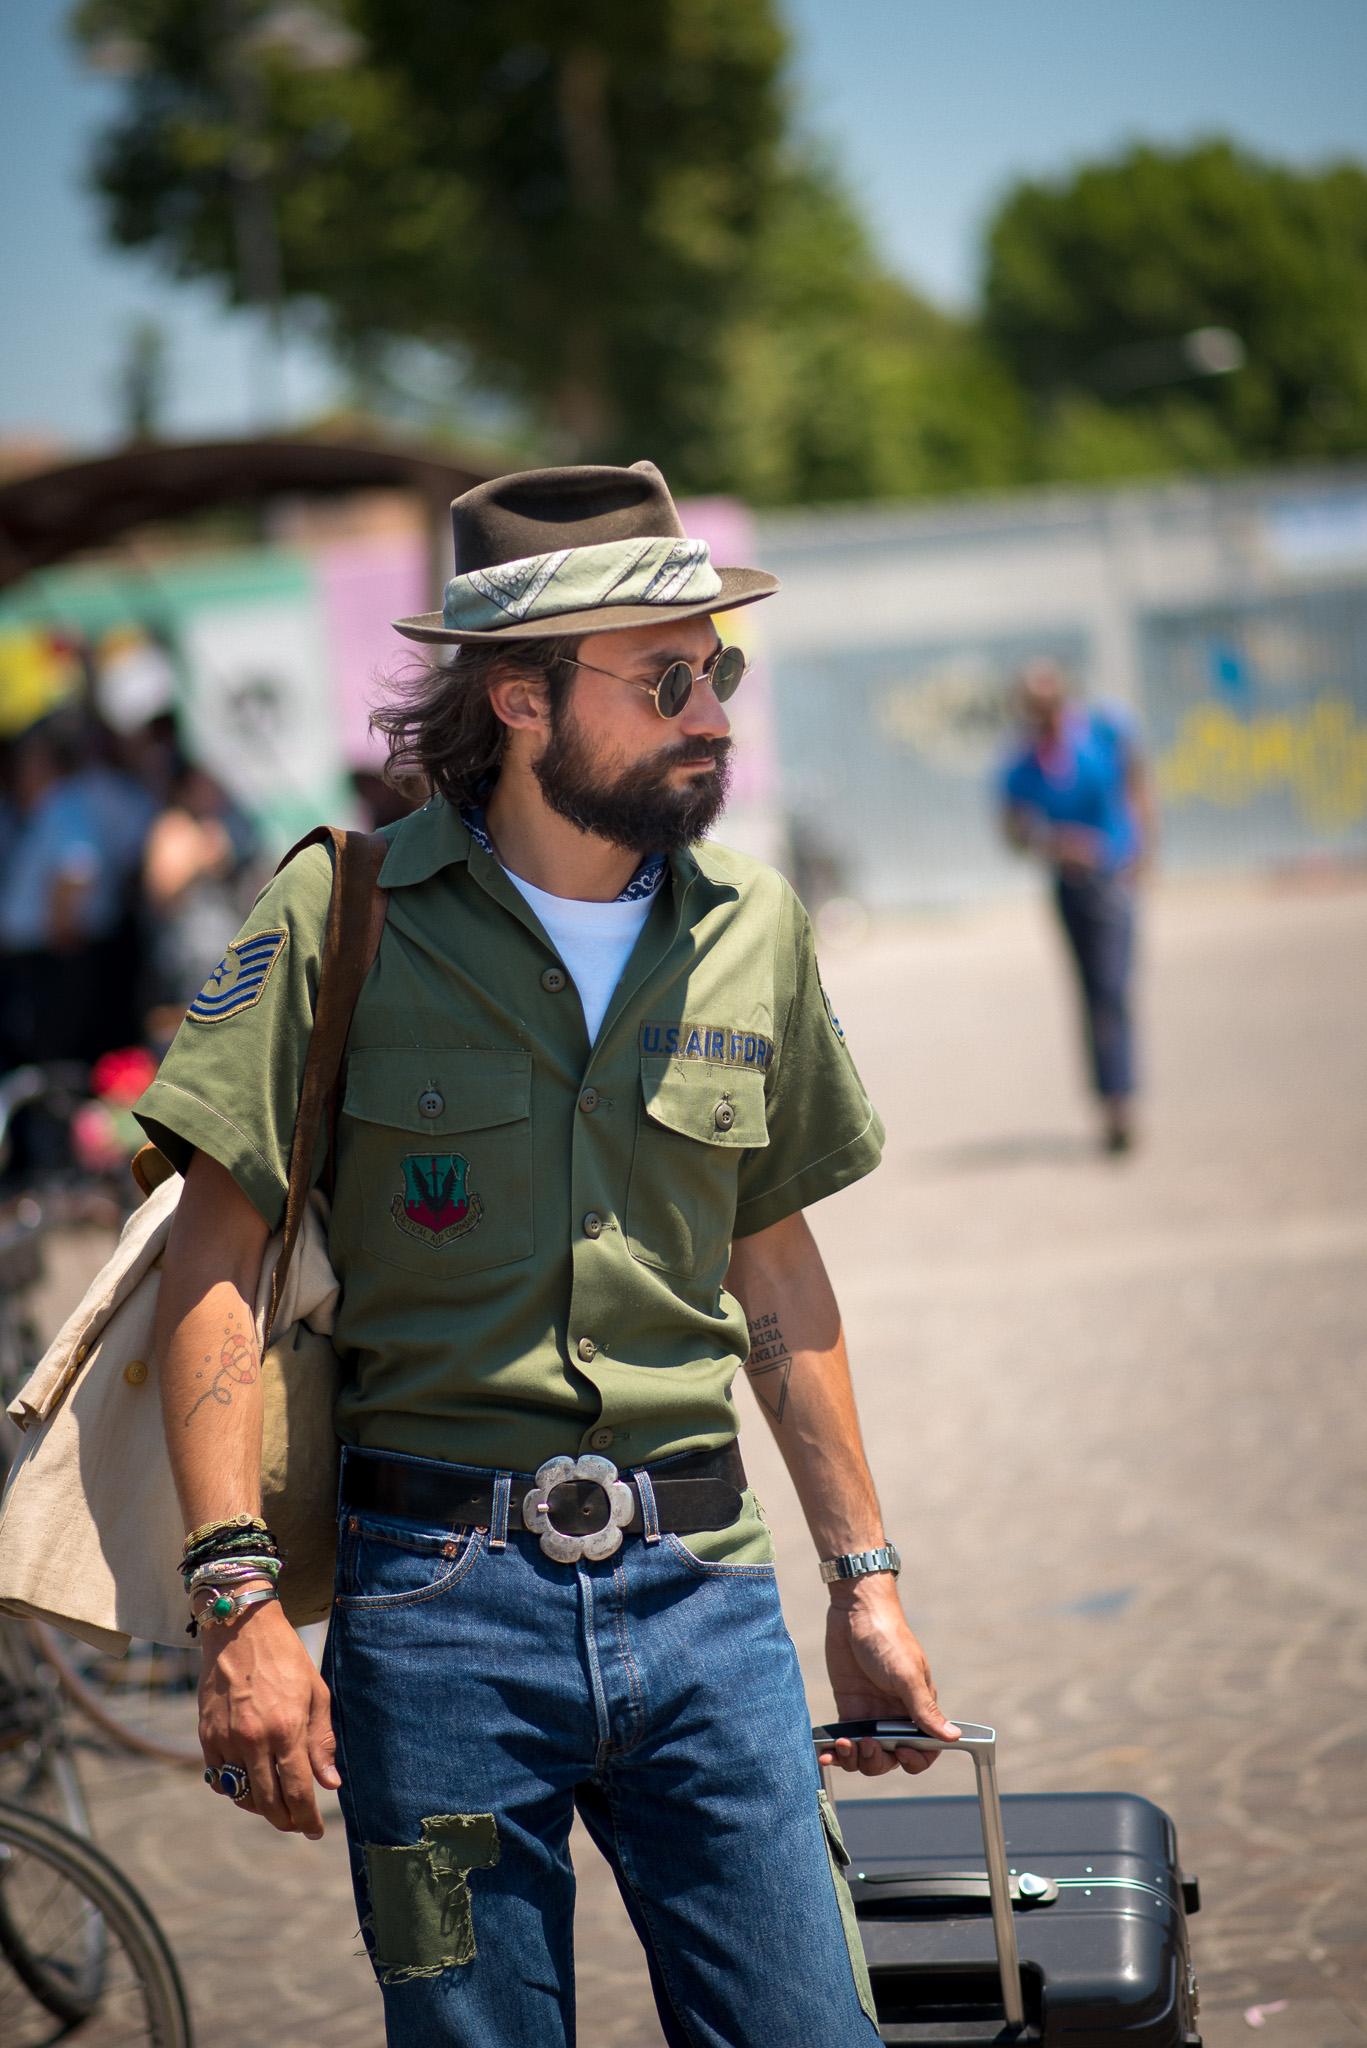 Lorenzo Don_Street Style_Pitti Uomo_Firenze_Florence_June 2017_Photography Annika Lagerqvist_www.annikasomething.com